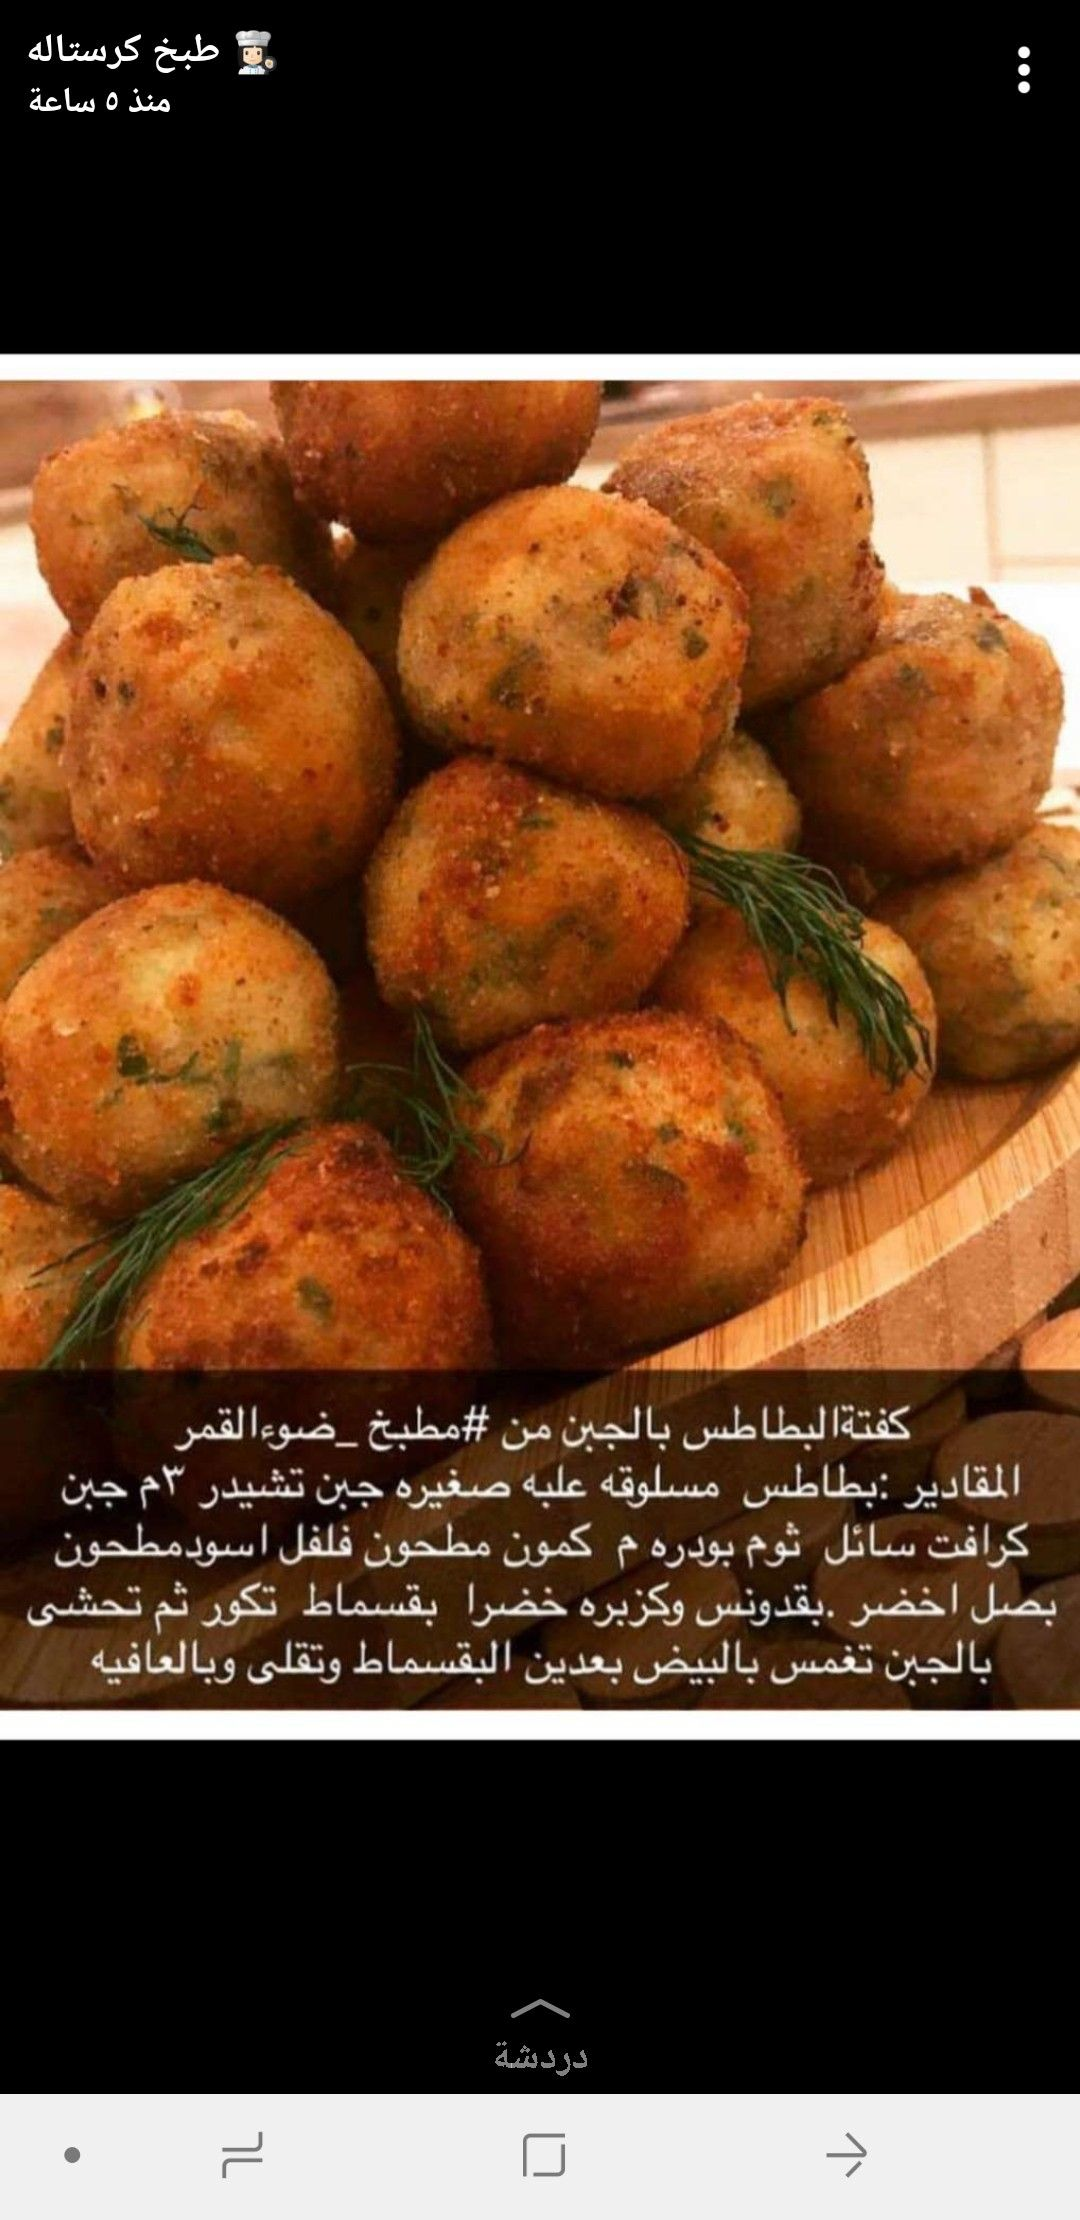 Pin By Jwan Dawood On وصفات من كل بلدان العربية Cooking Recipes Arabic Food